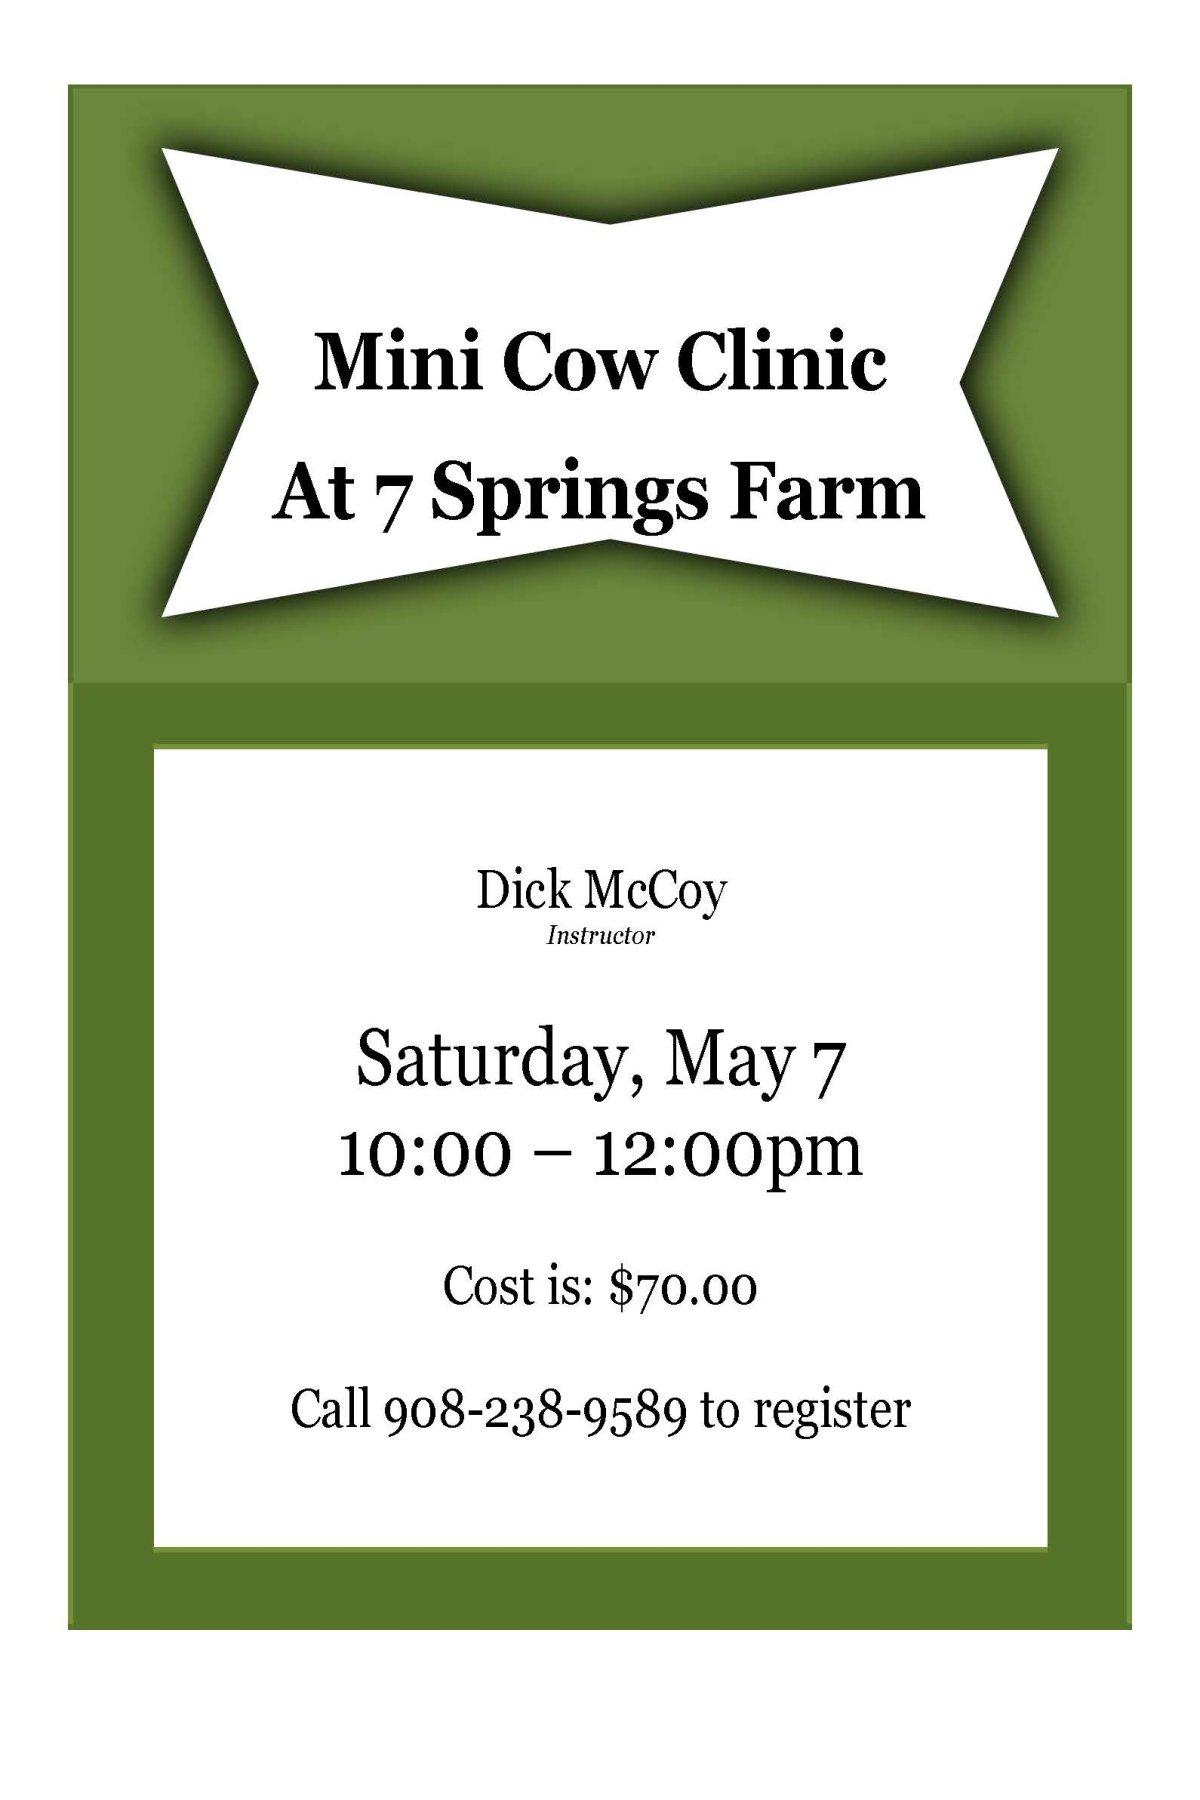 Mini Cow Clinic